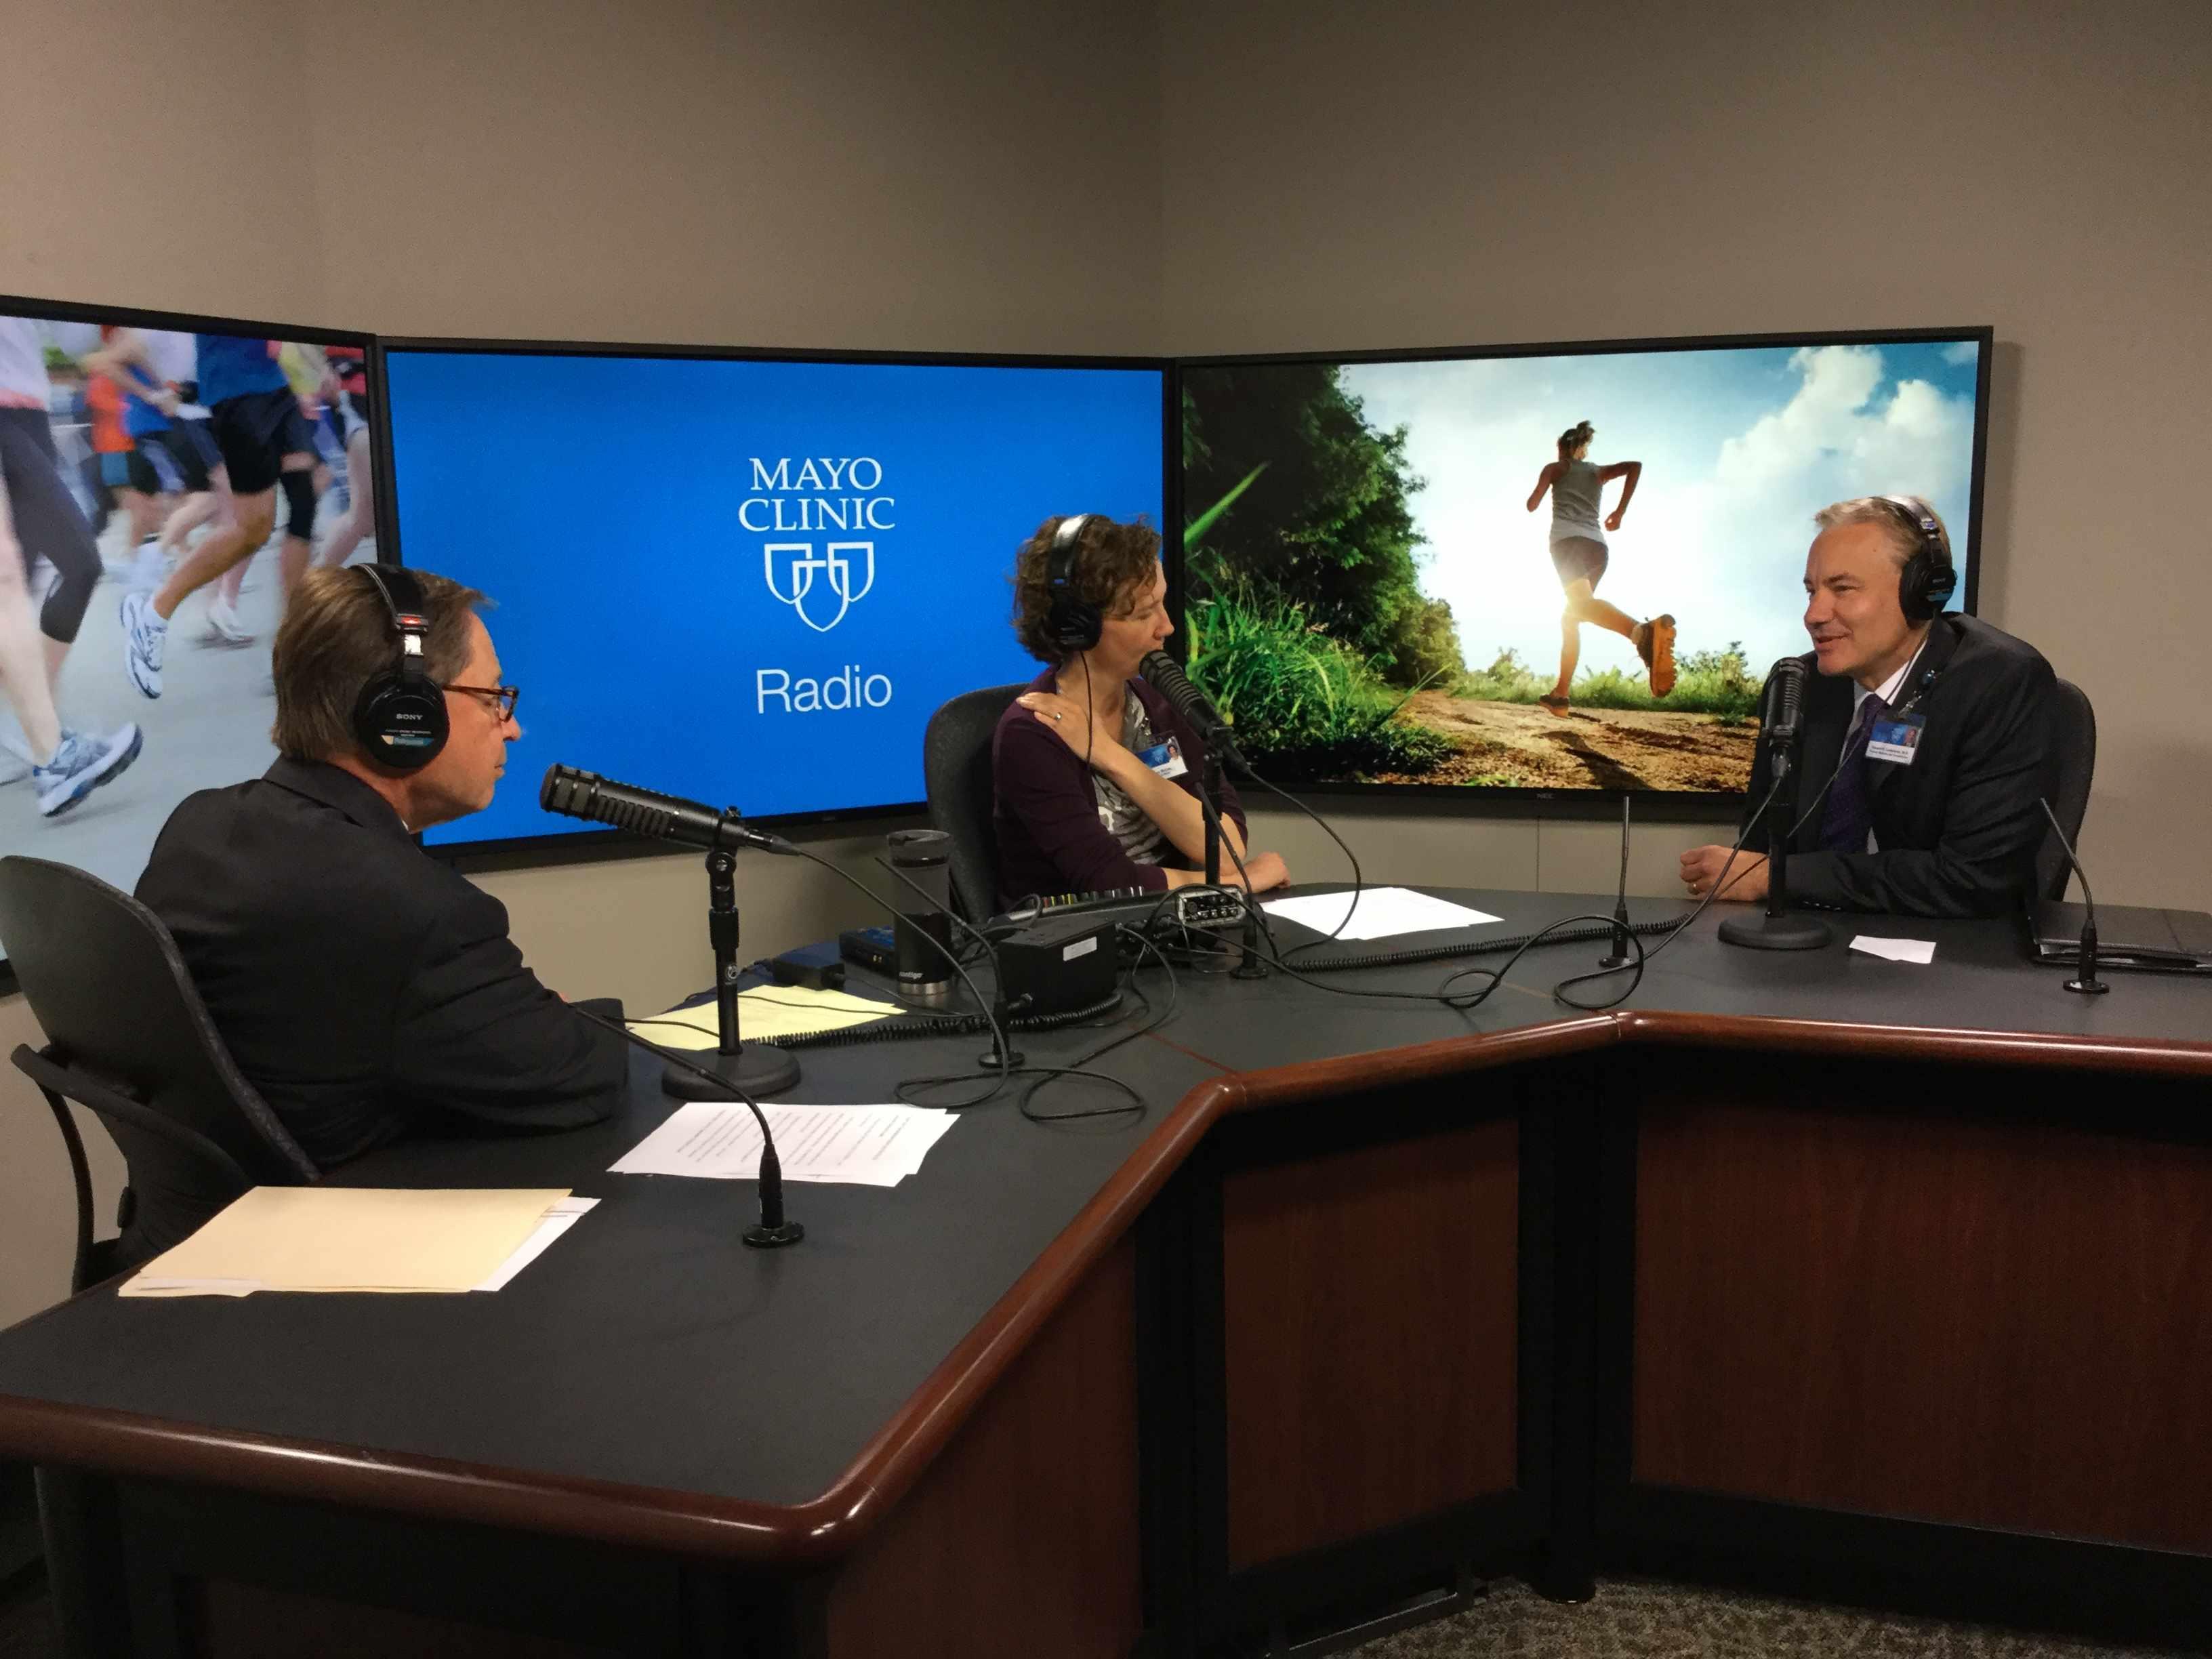 Dr. Ed Laskowski being interviewed on Mayo Clinic Radio